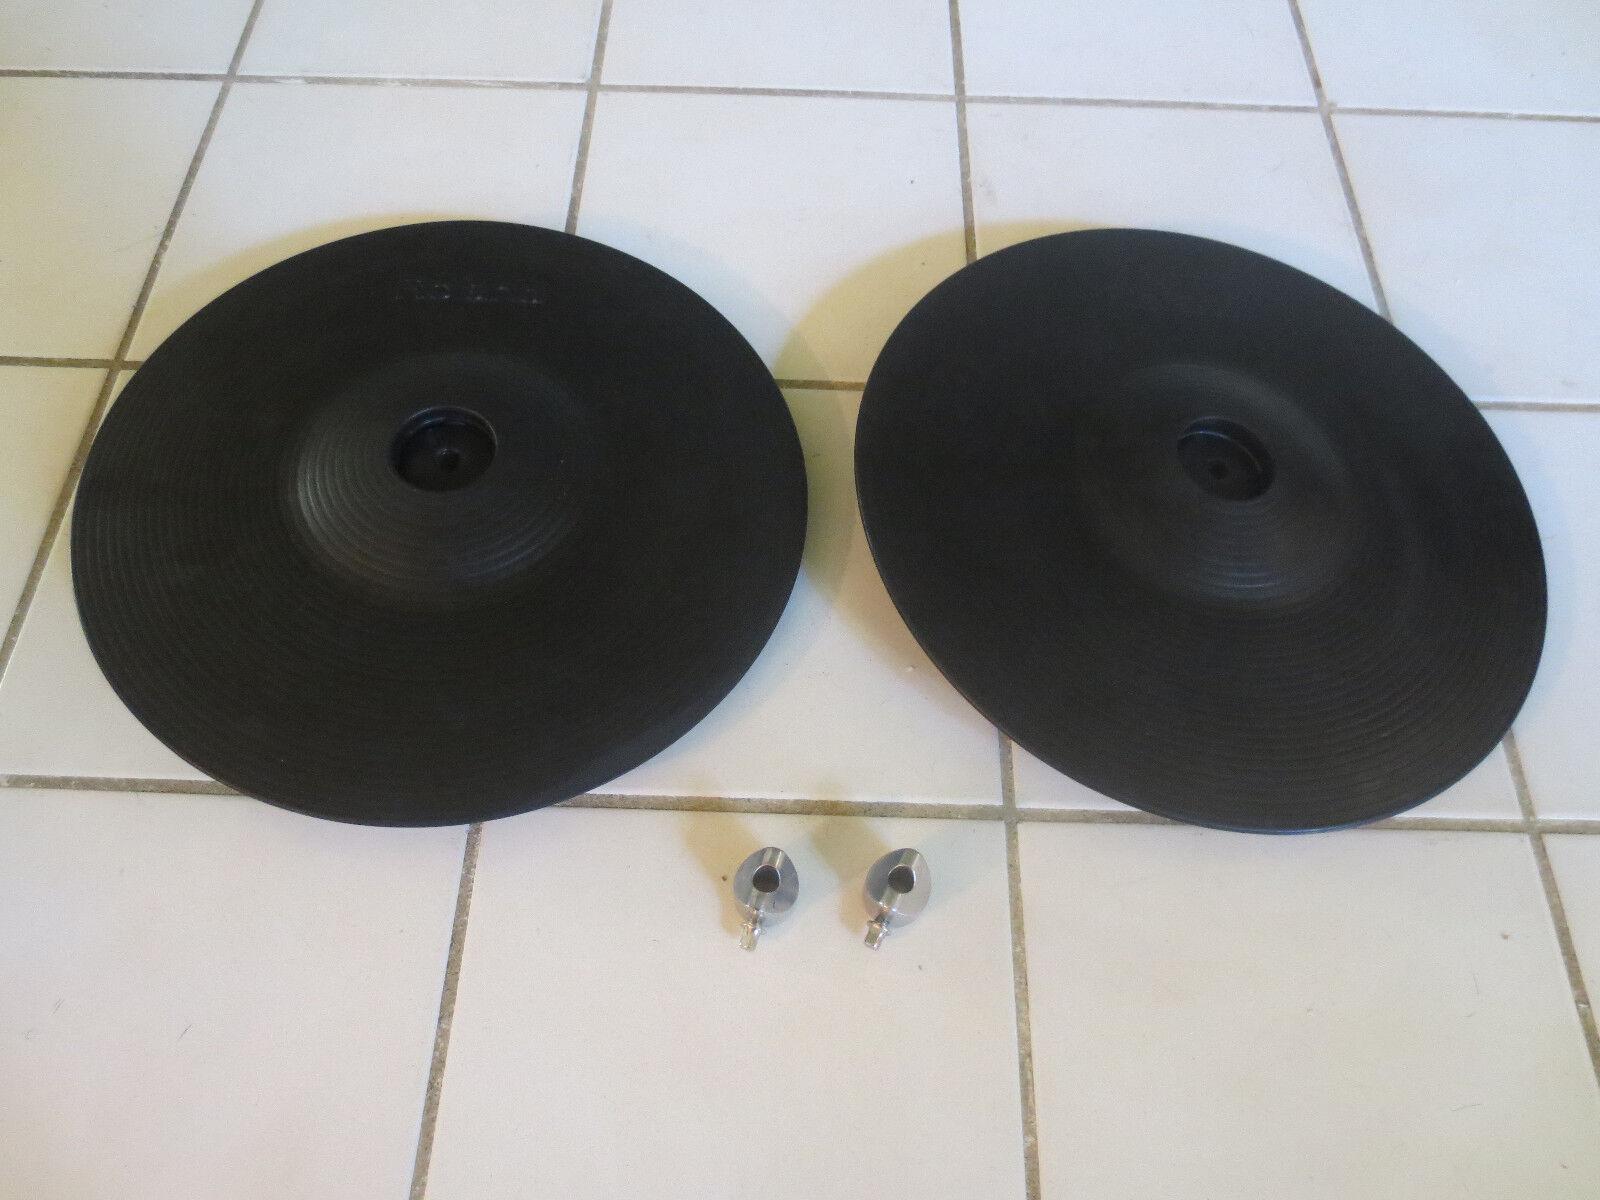 TWO Roland CY-12R C 3 Way Trigger V-Cymbal Crash Ride V-Drum w  Stopper 12 r c